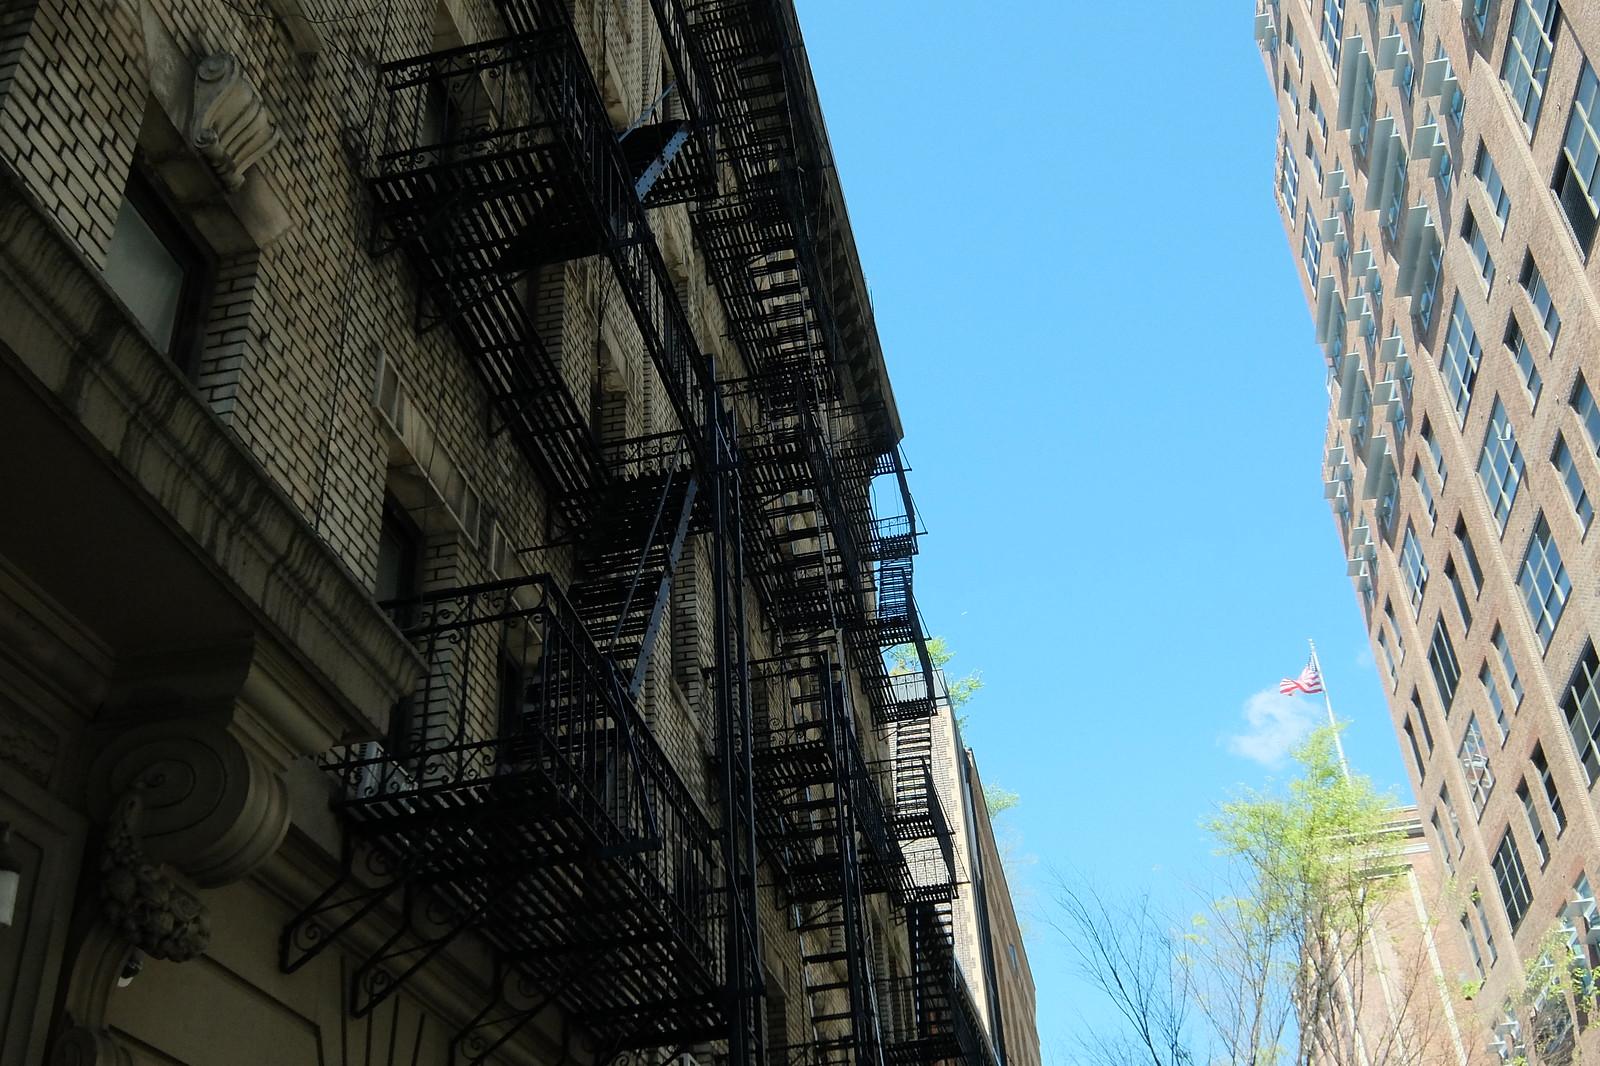 The New York Chelsea photo by FUJIFILM XQ1